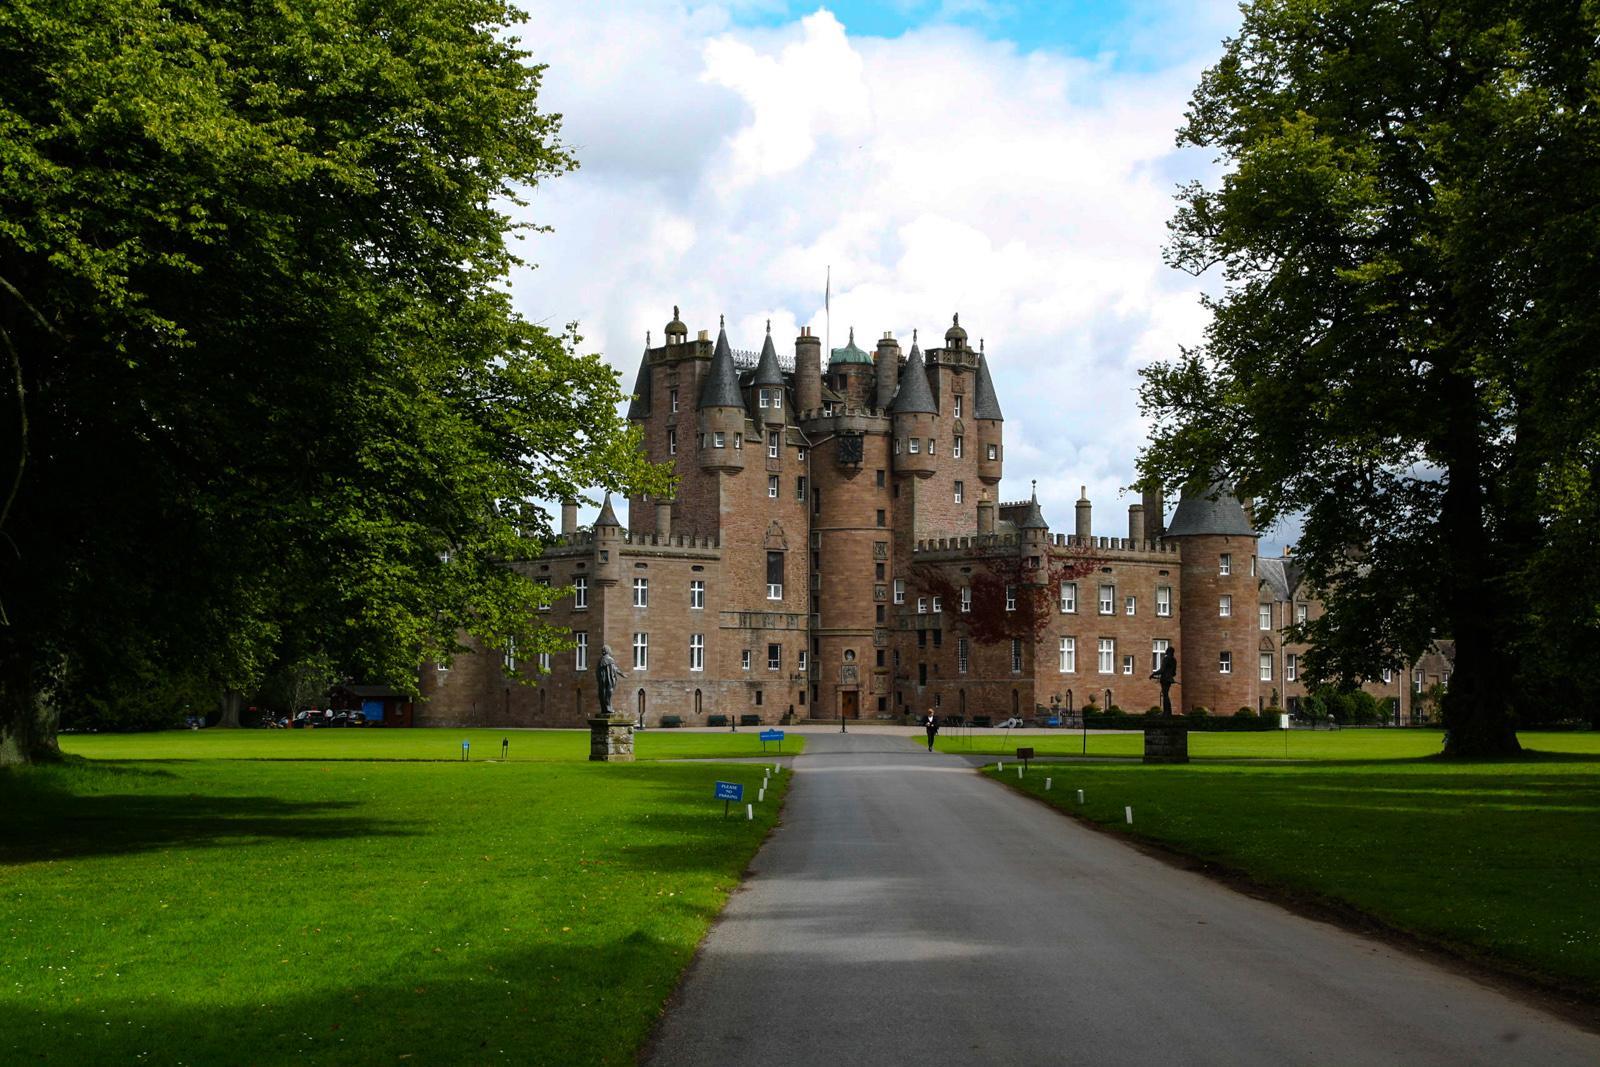 2. Glamis Castle